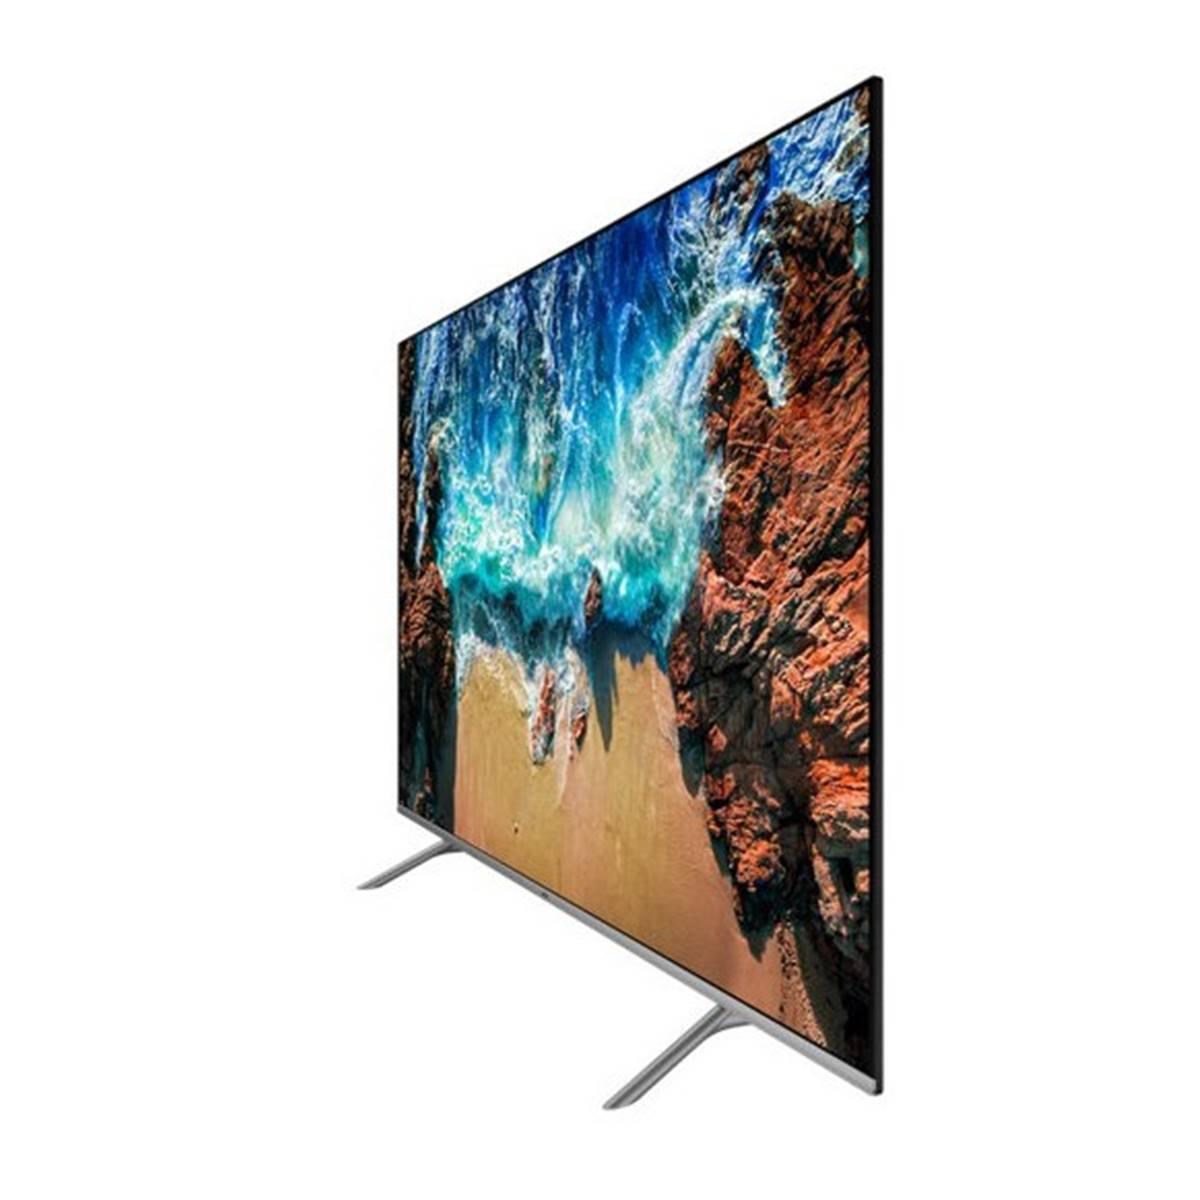 Ecran Tv Samsung Ue82nu8005txxc